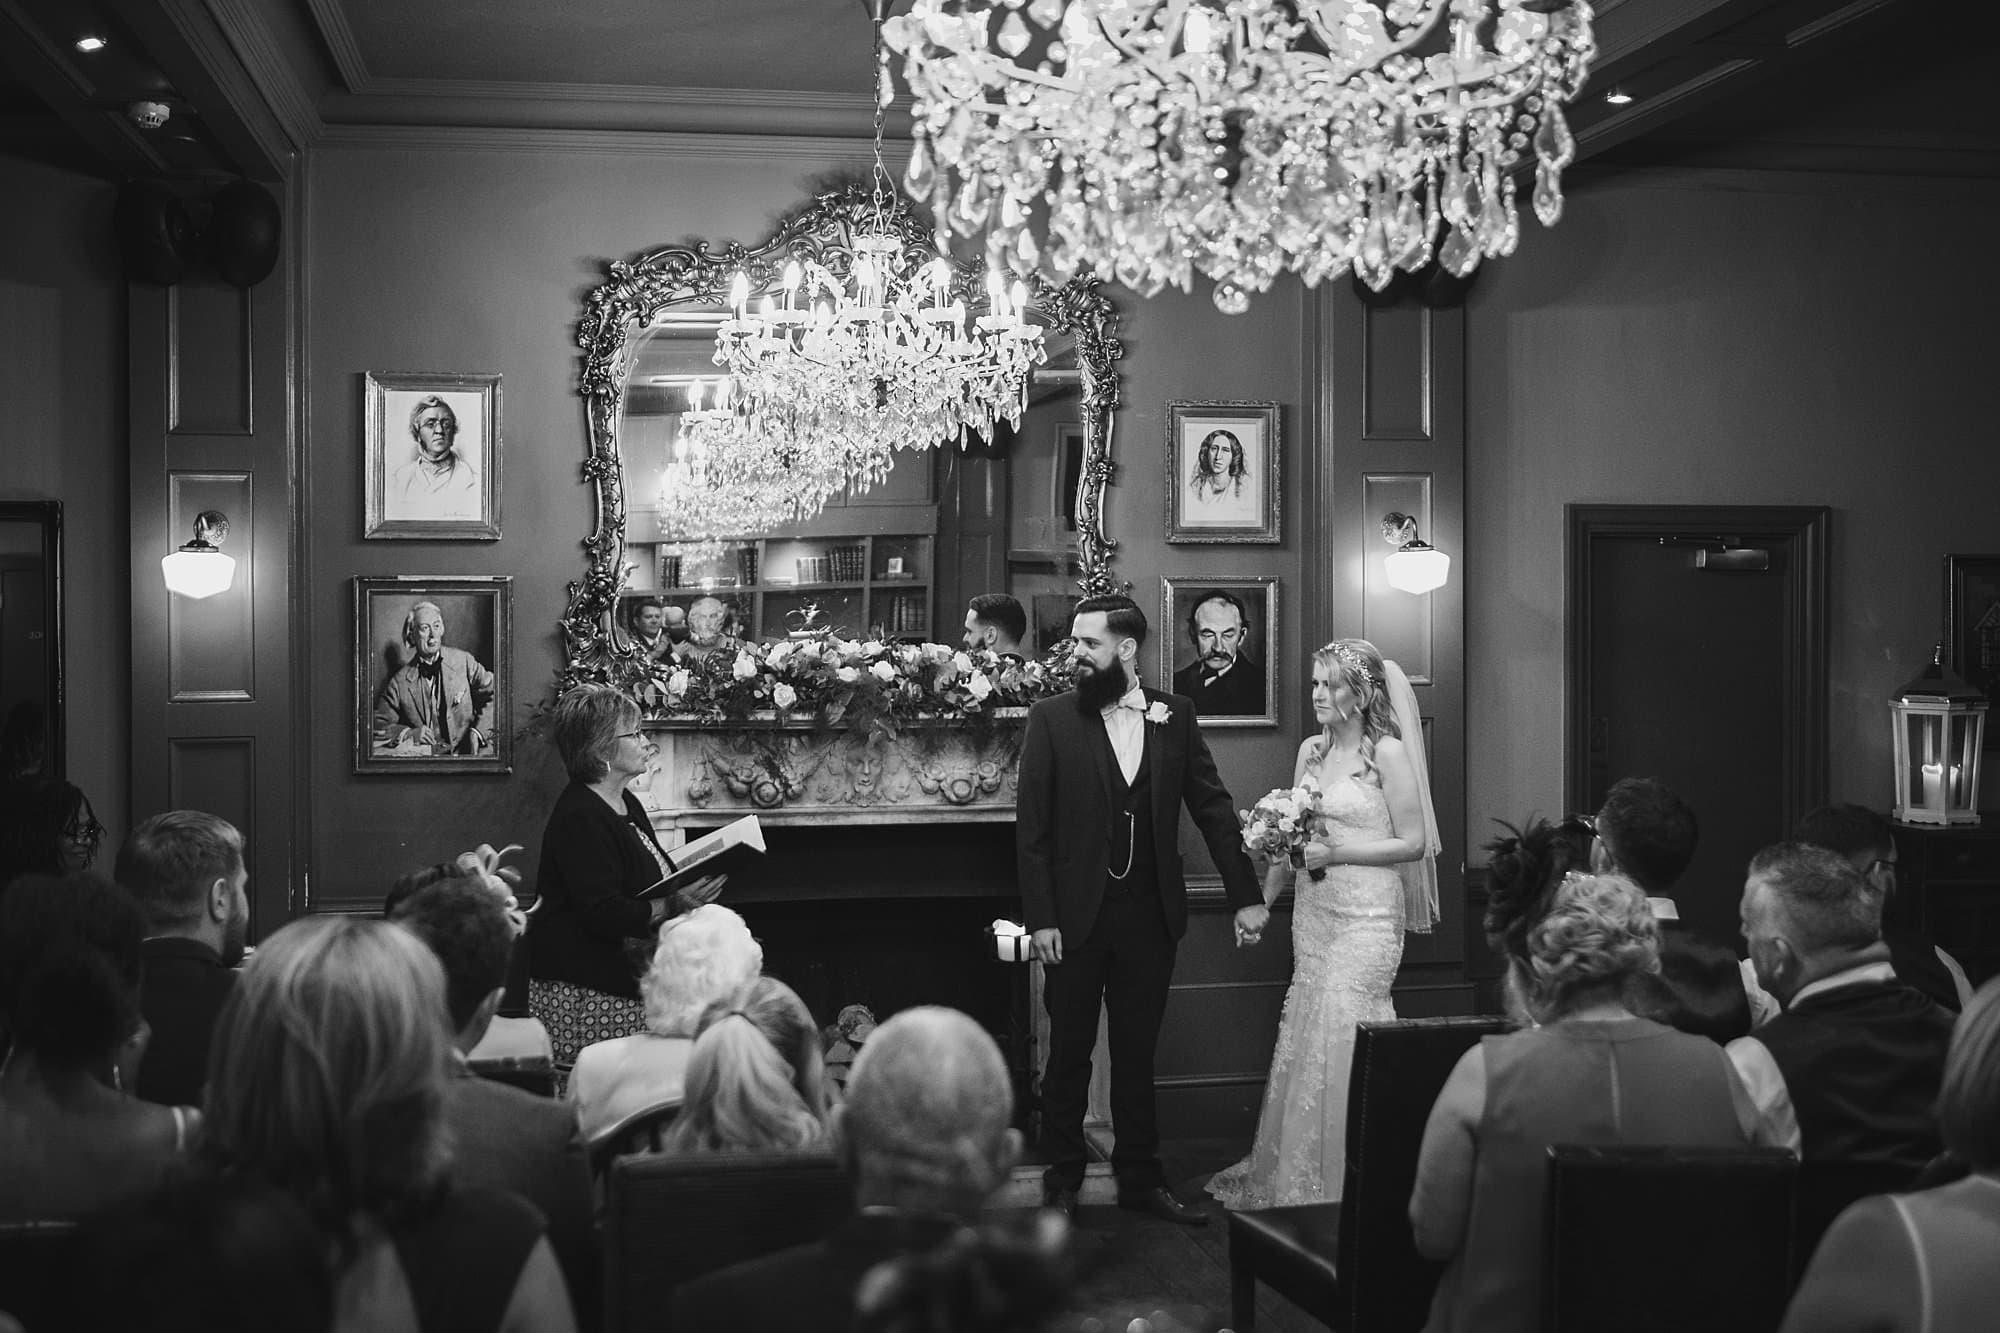 london pub wedding photographer jn 014 - The County Arms Wedding Photographer   Jen & Nick